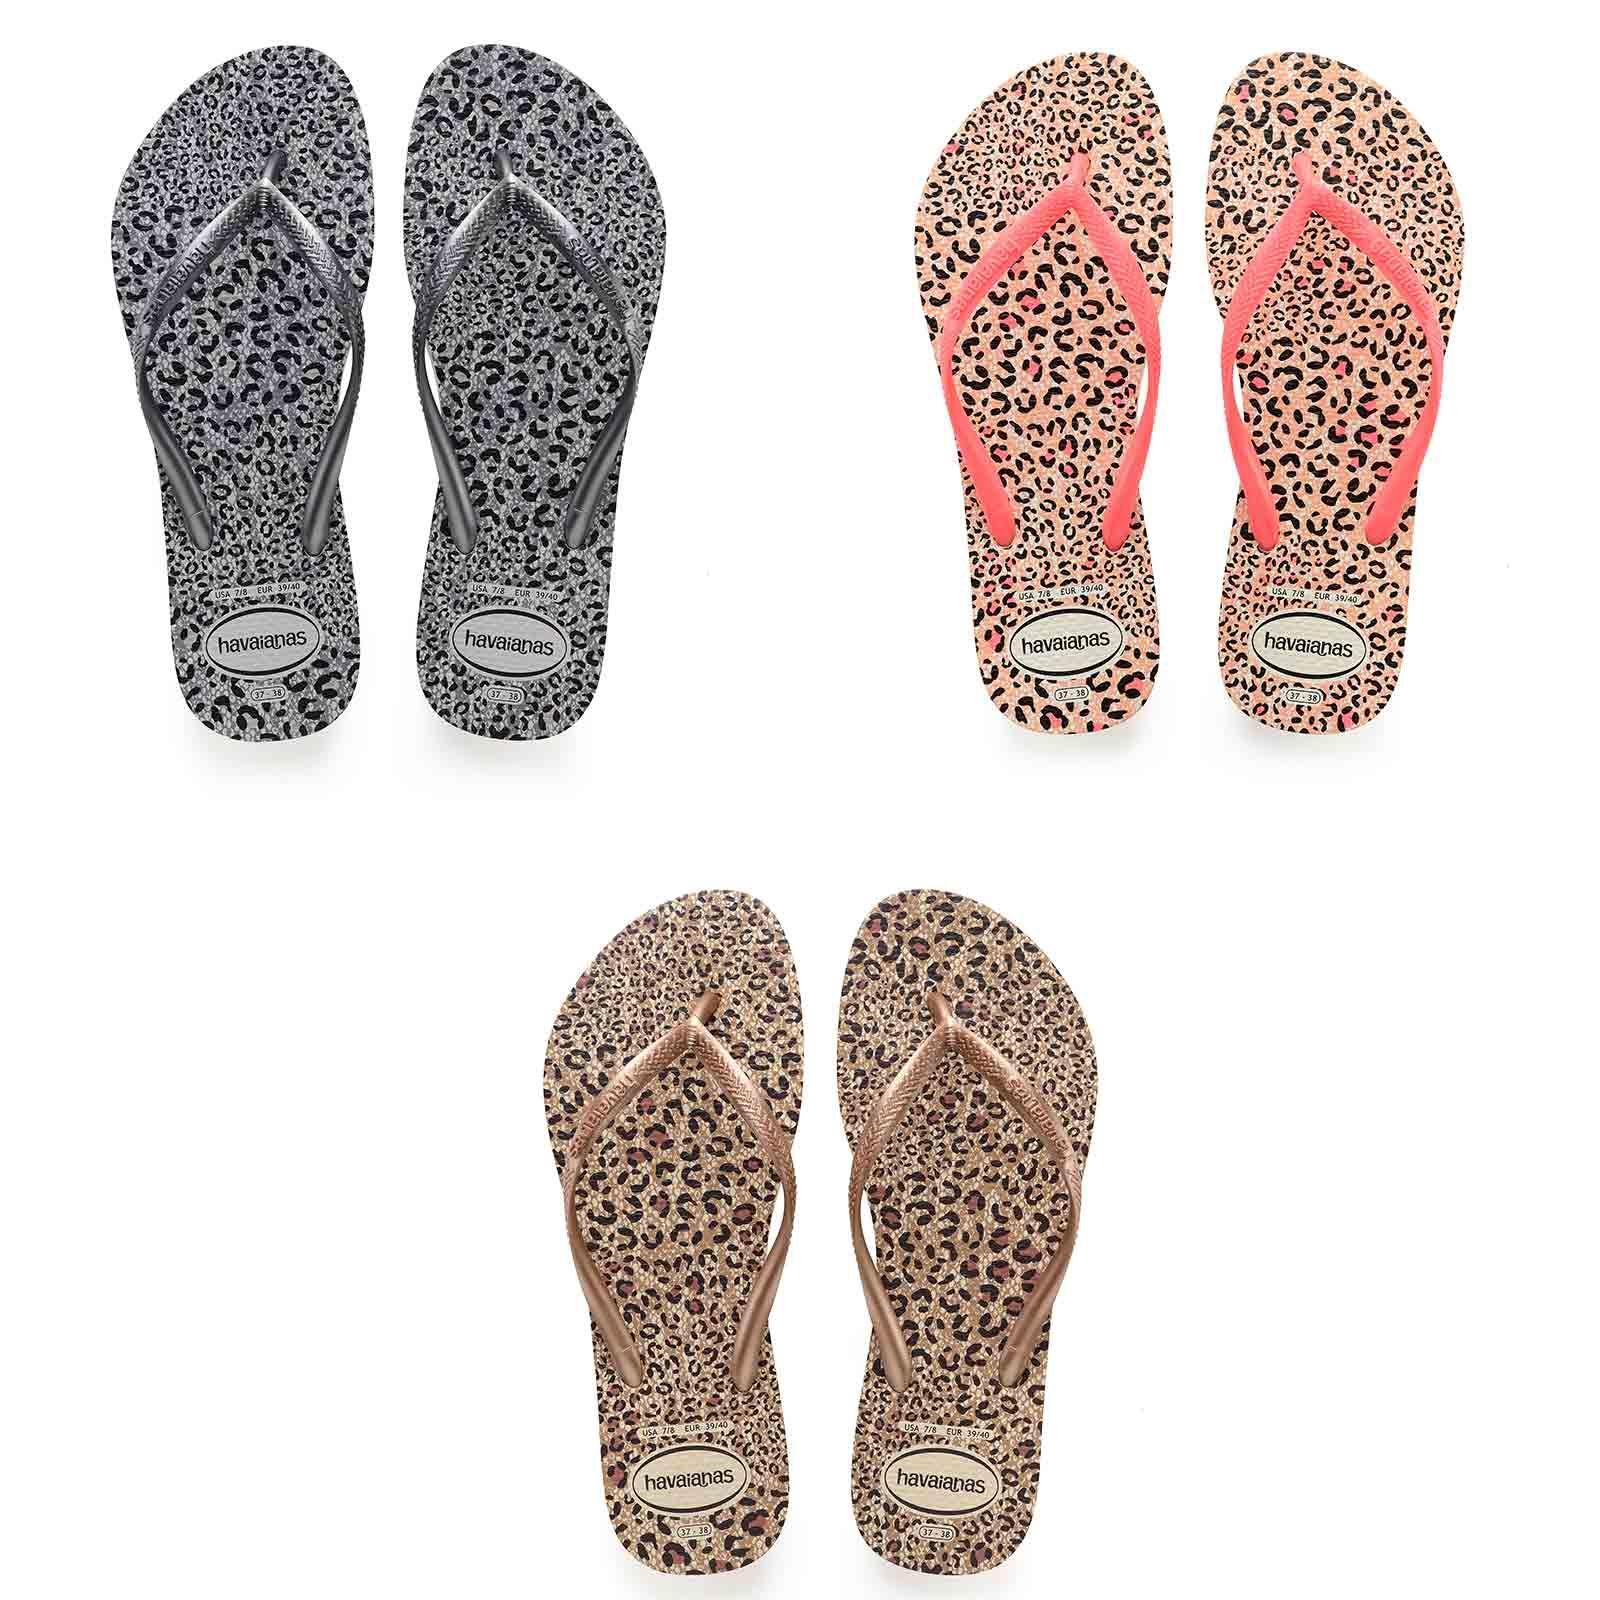 4e98670c7 Details about Havaianas Slim Animals Flip Flops Women Summer Beach Pool Sandals  Animal Print